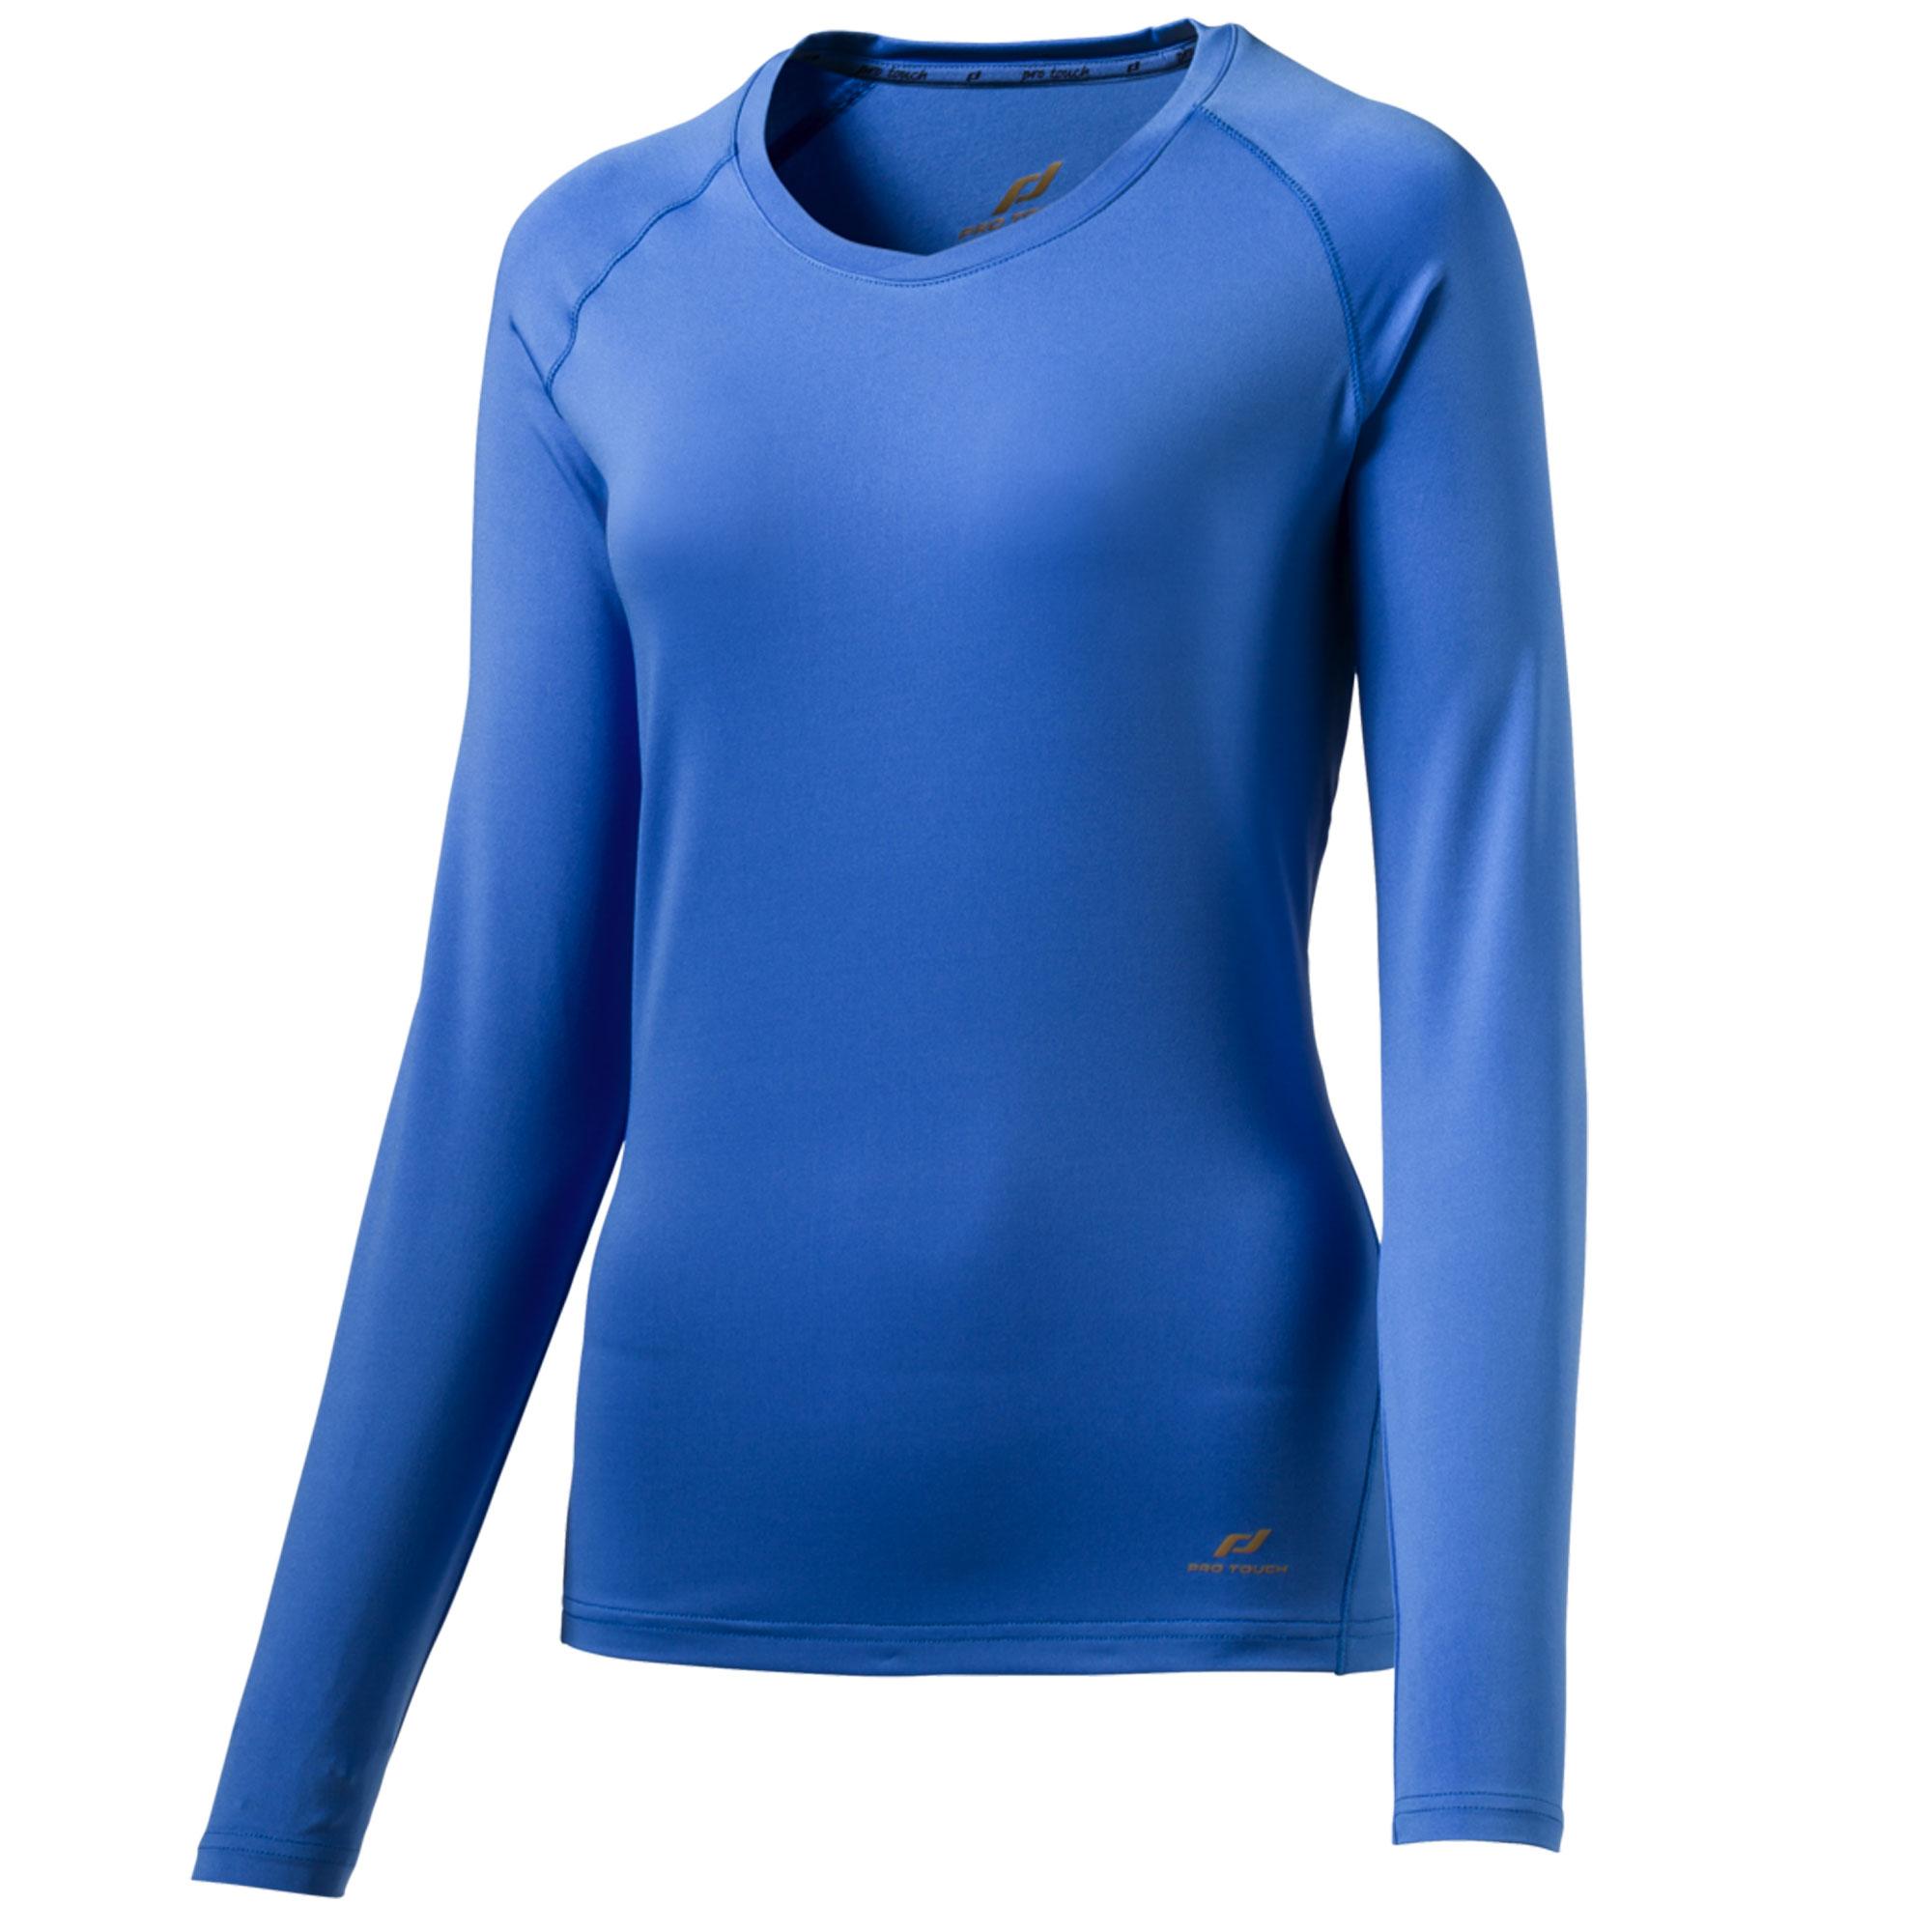 Pro Touch Wilma wms Funktionsshirt Laufshirt langarm Damen melange//blue aqua